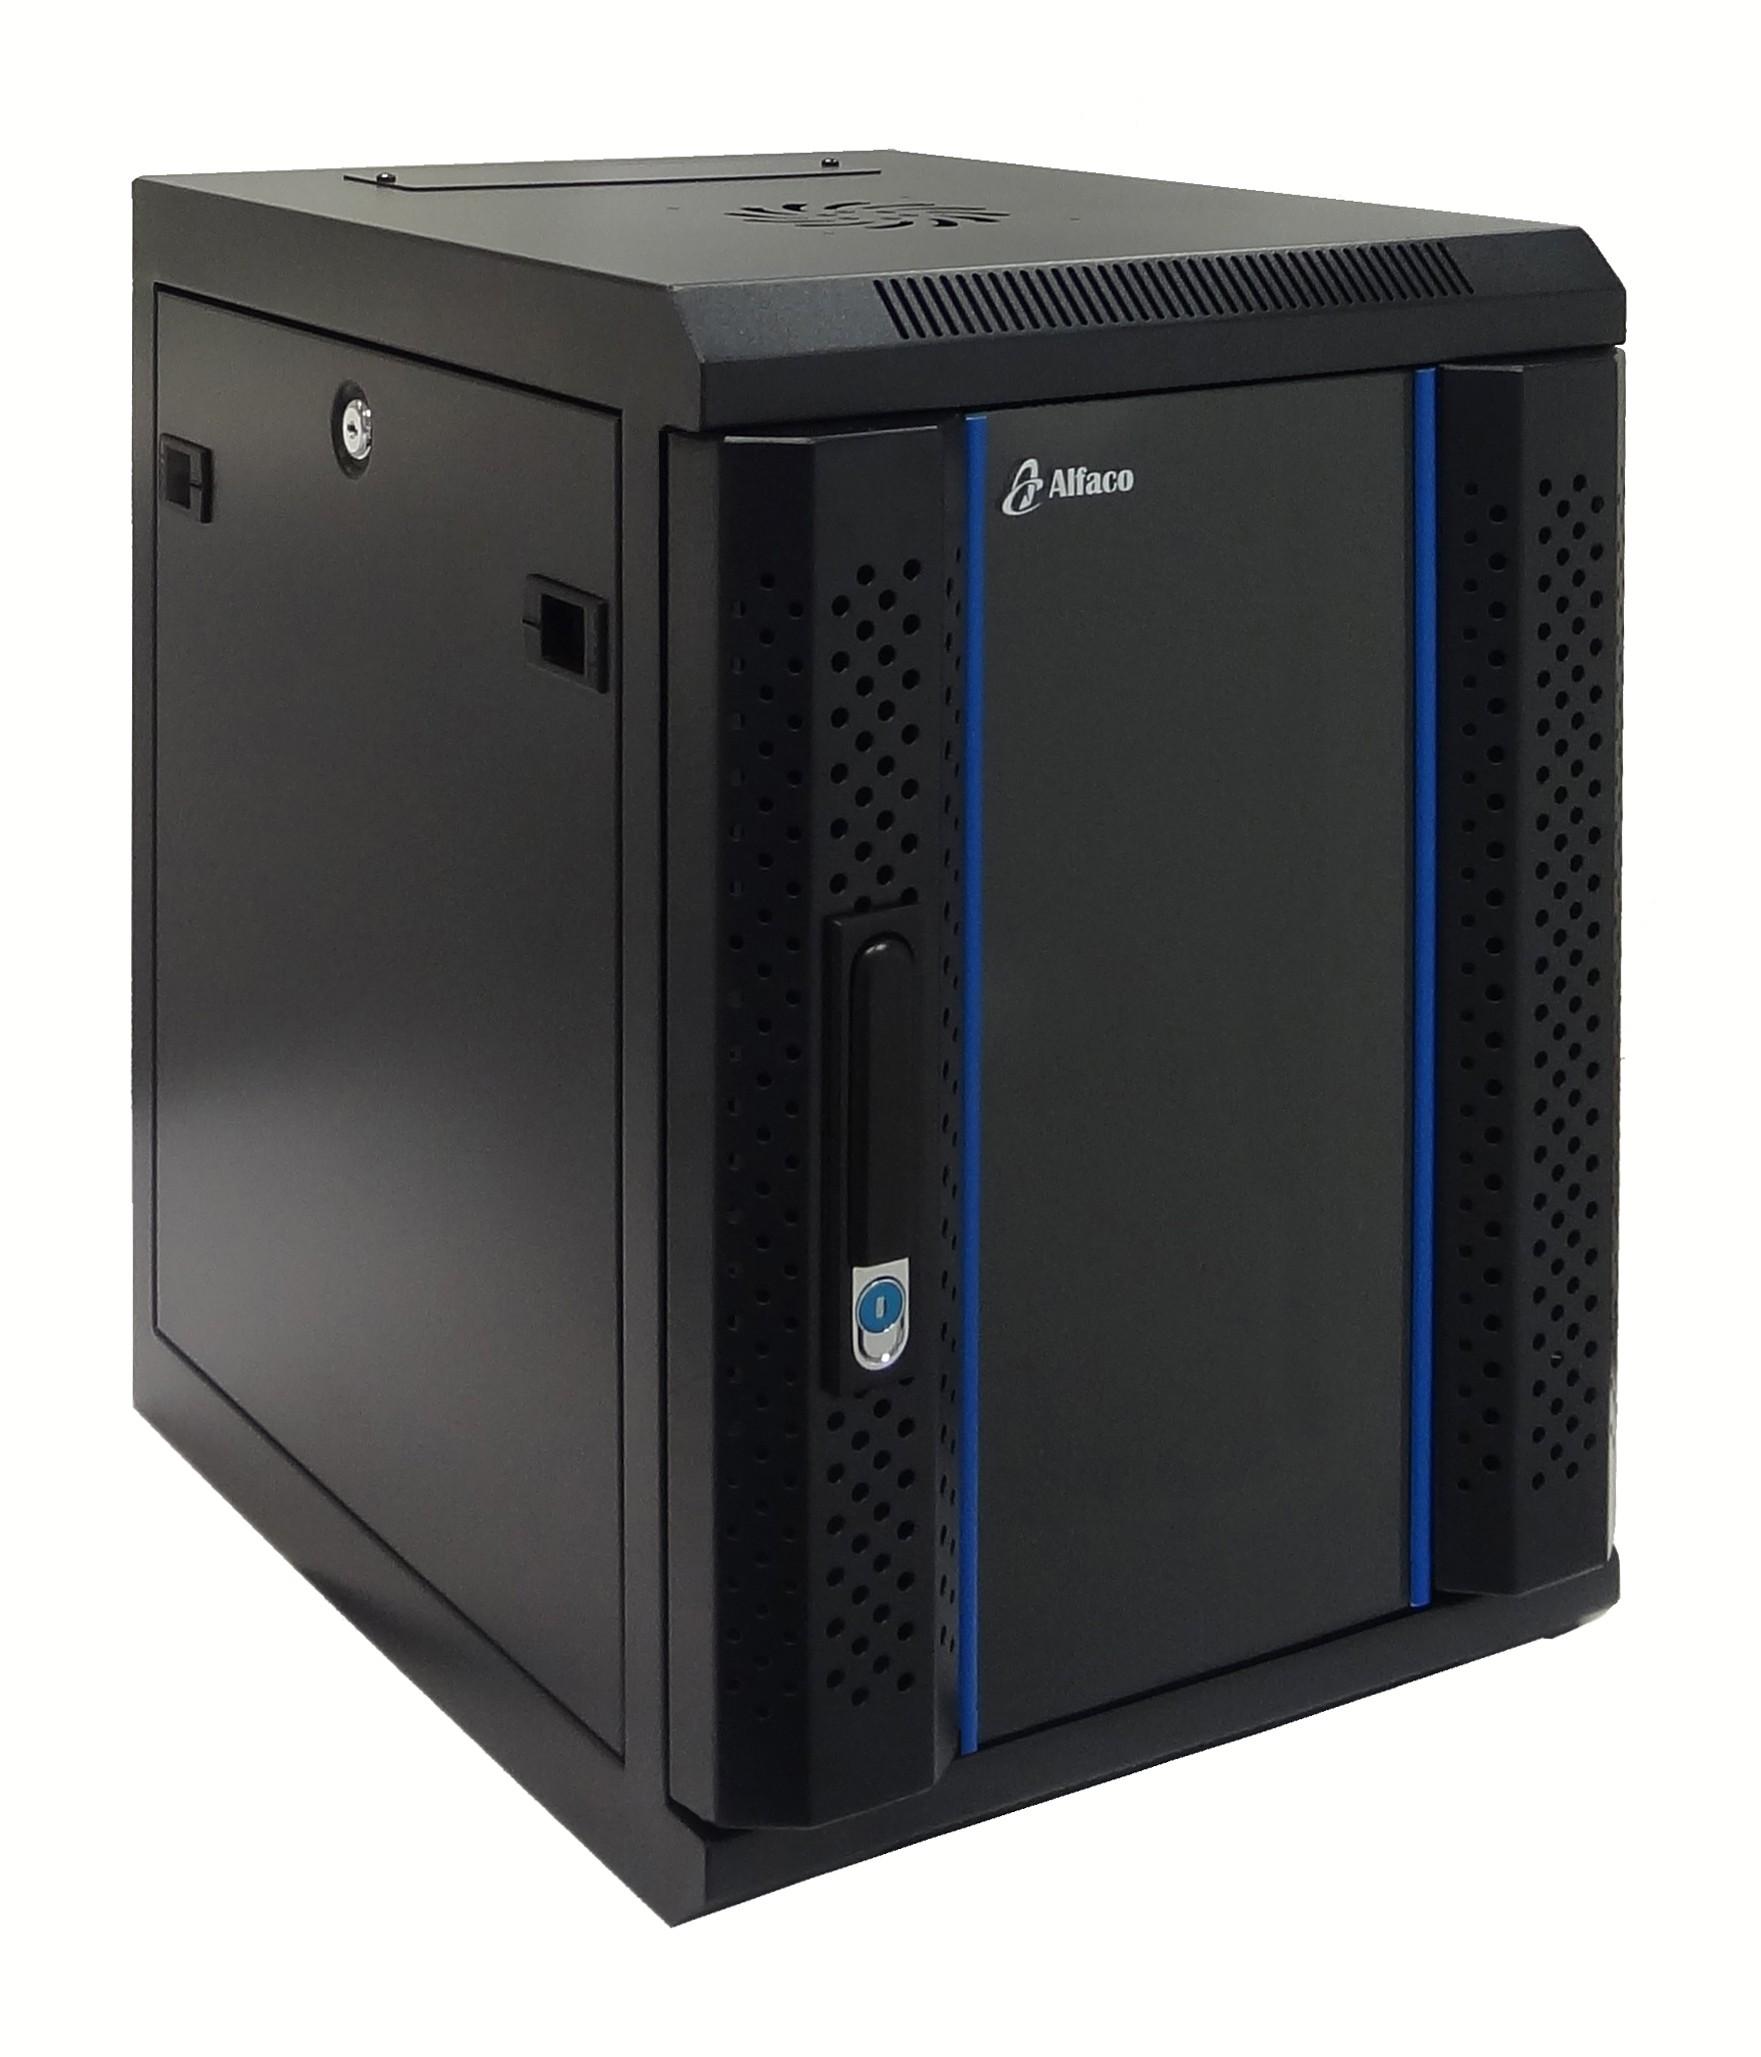 9 HE 10 Zoll Serverschrank - 450mm tief - schwarz - komplett montiert - 1